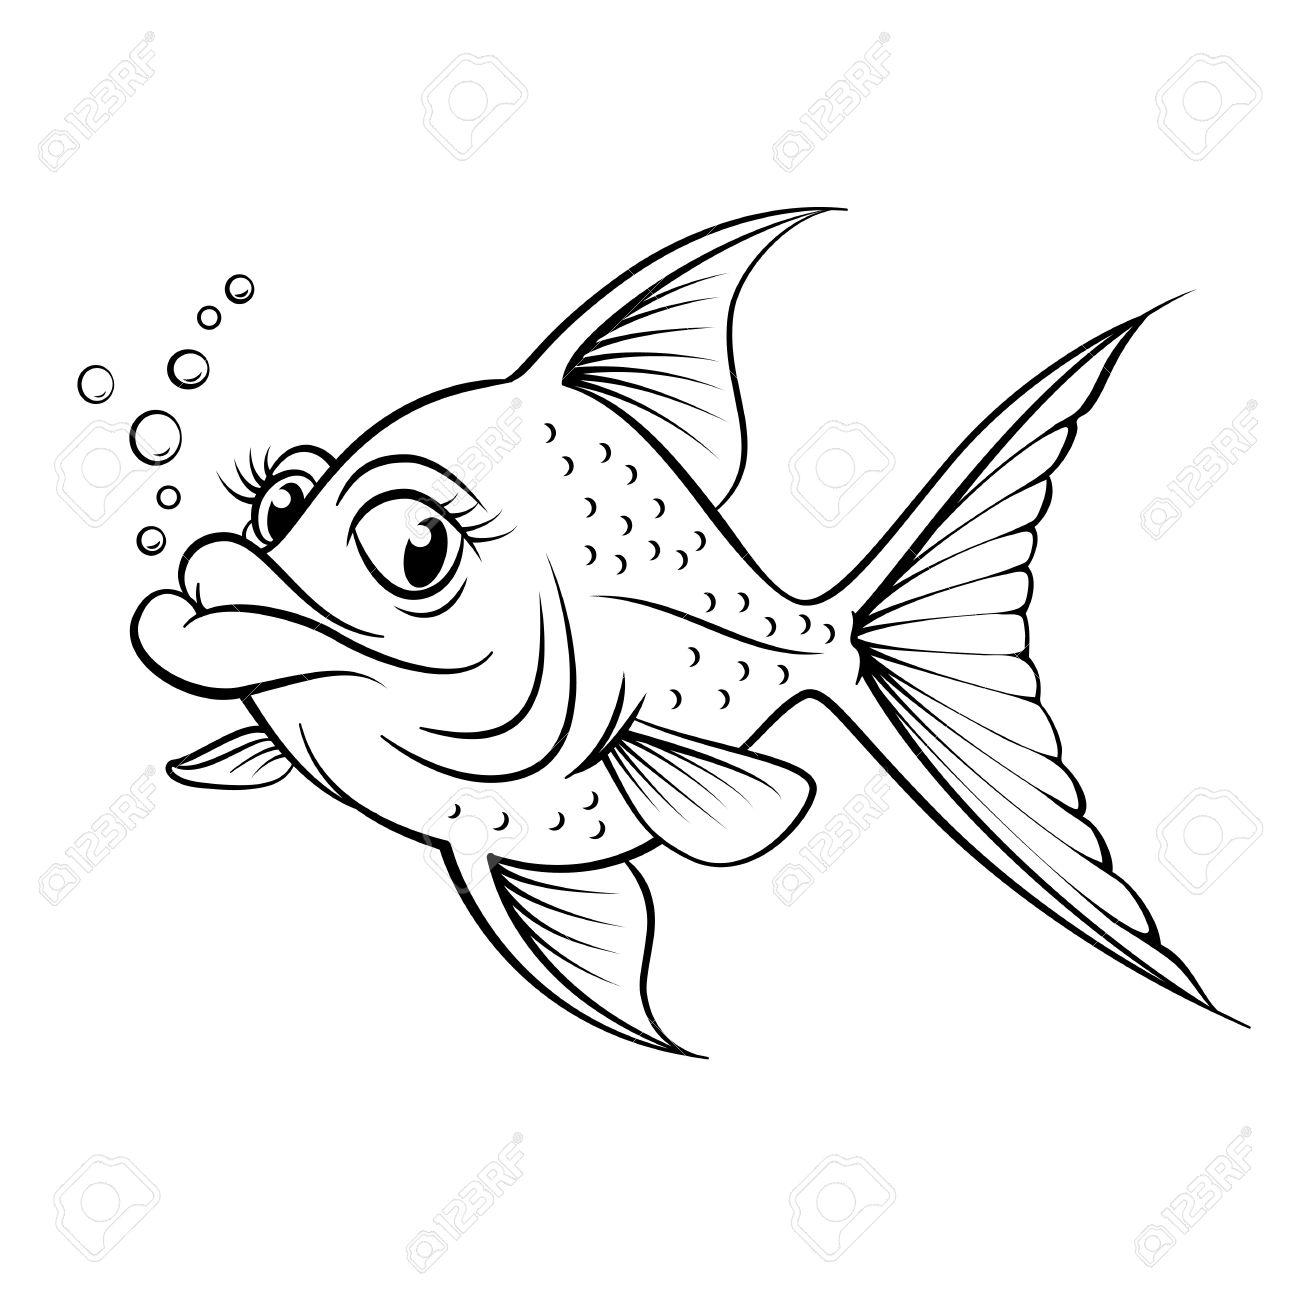 Cartoon Drawing Fish